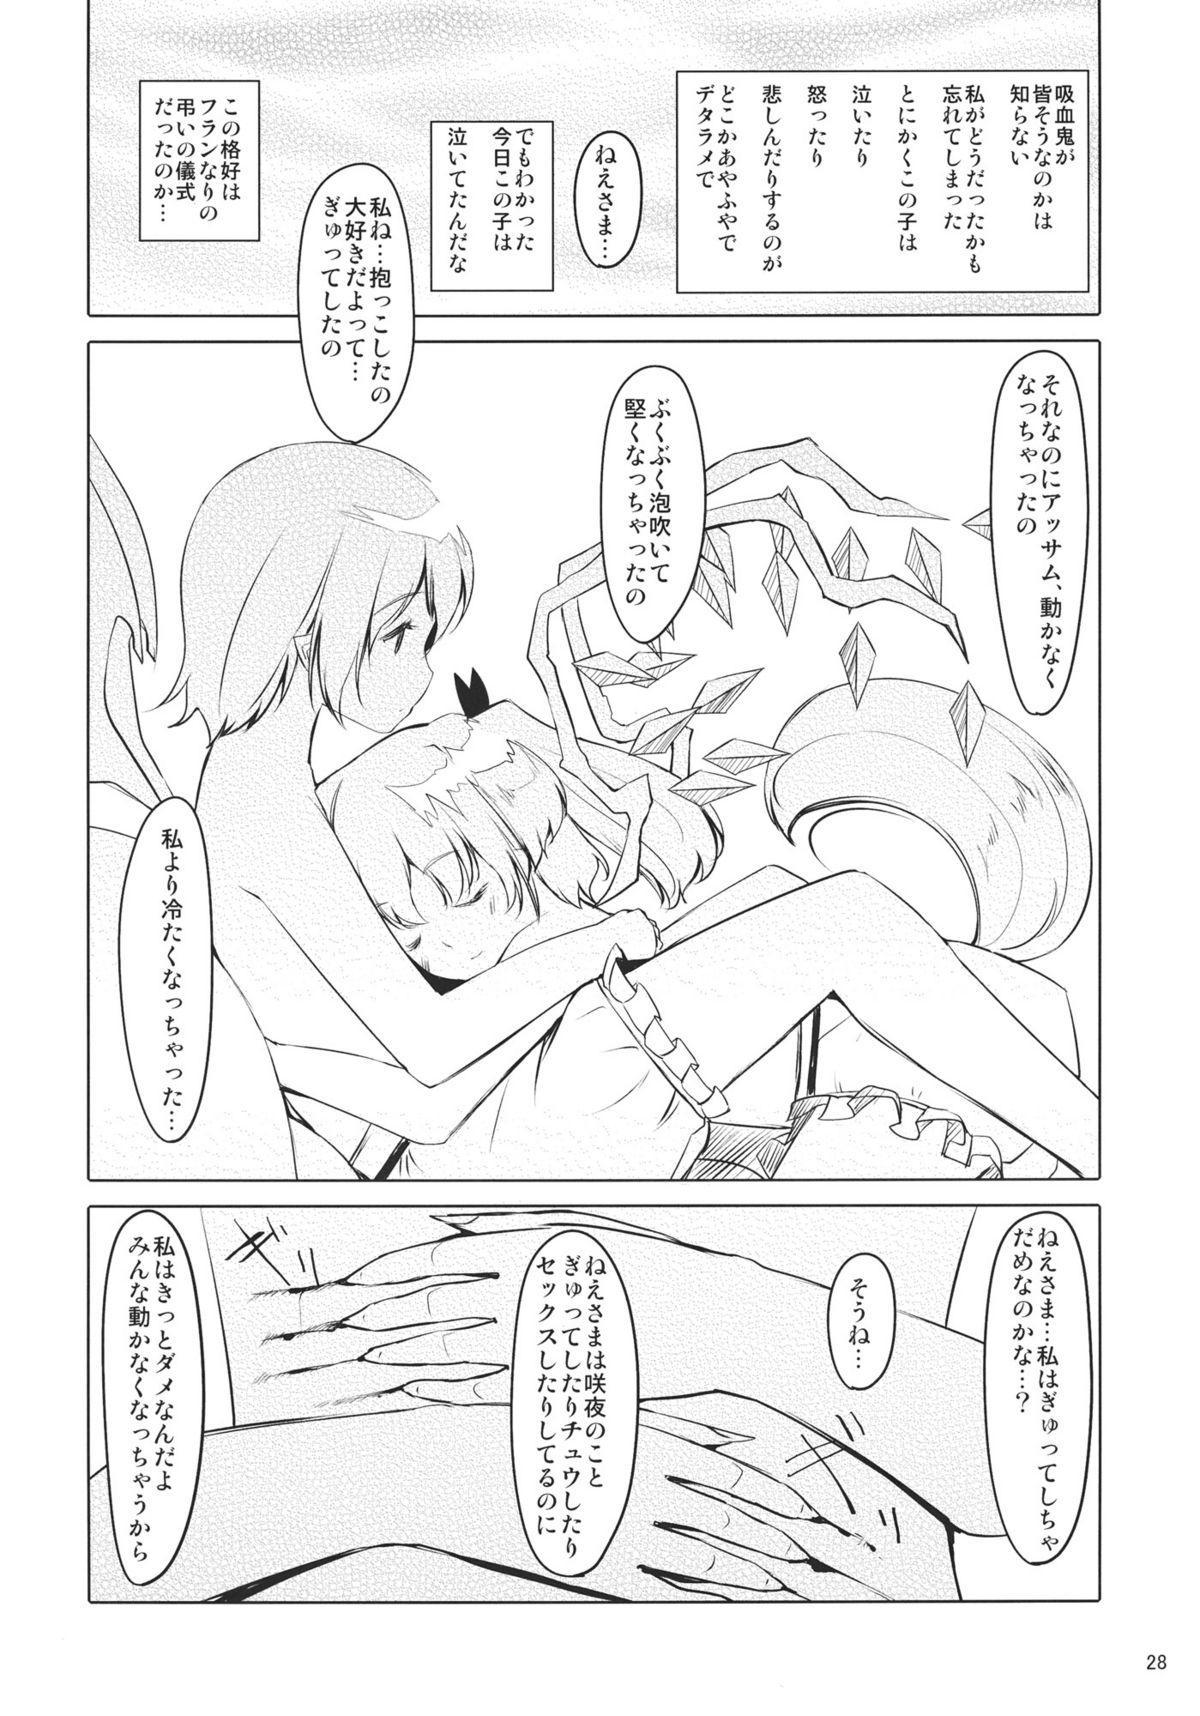 Flan-chan Infinity 29